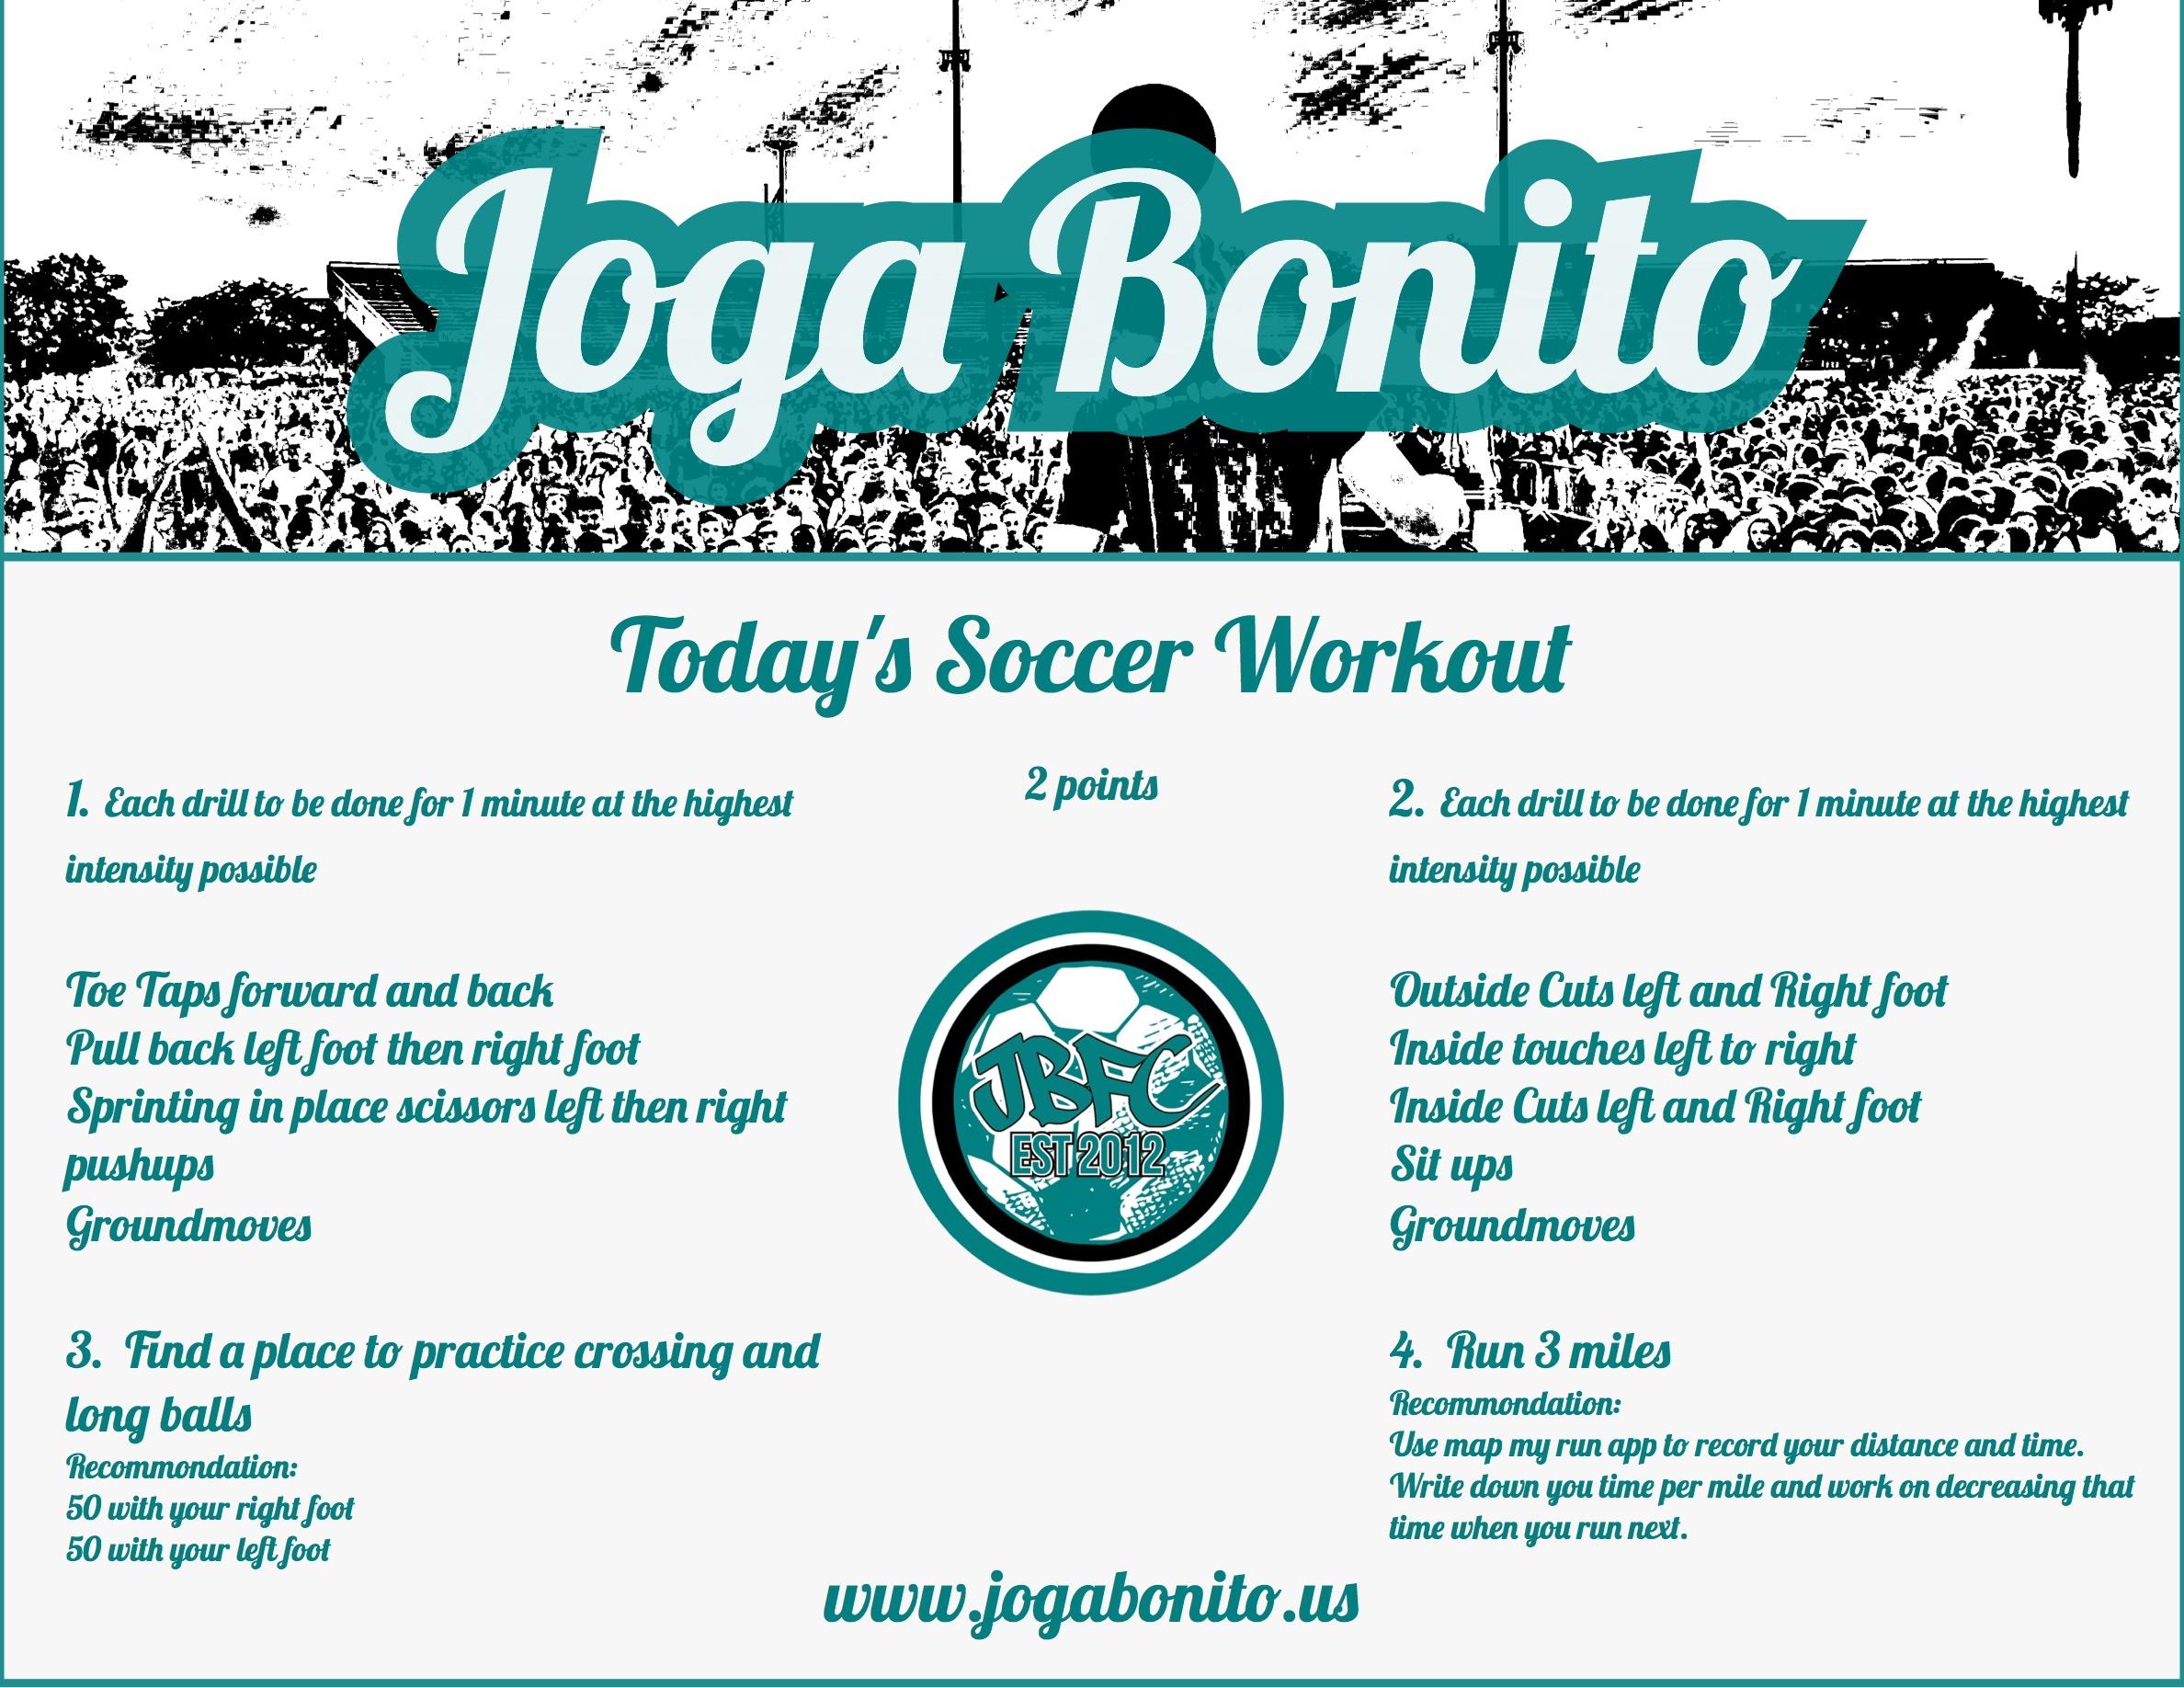 Soccer Workout April 18 2020